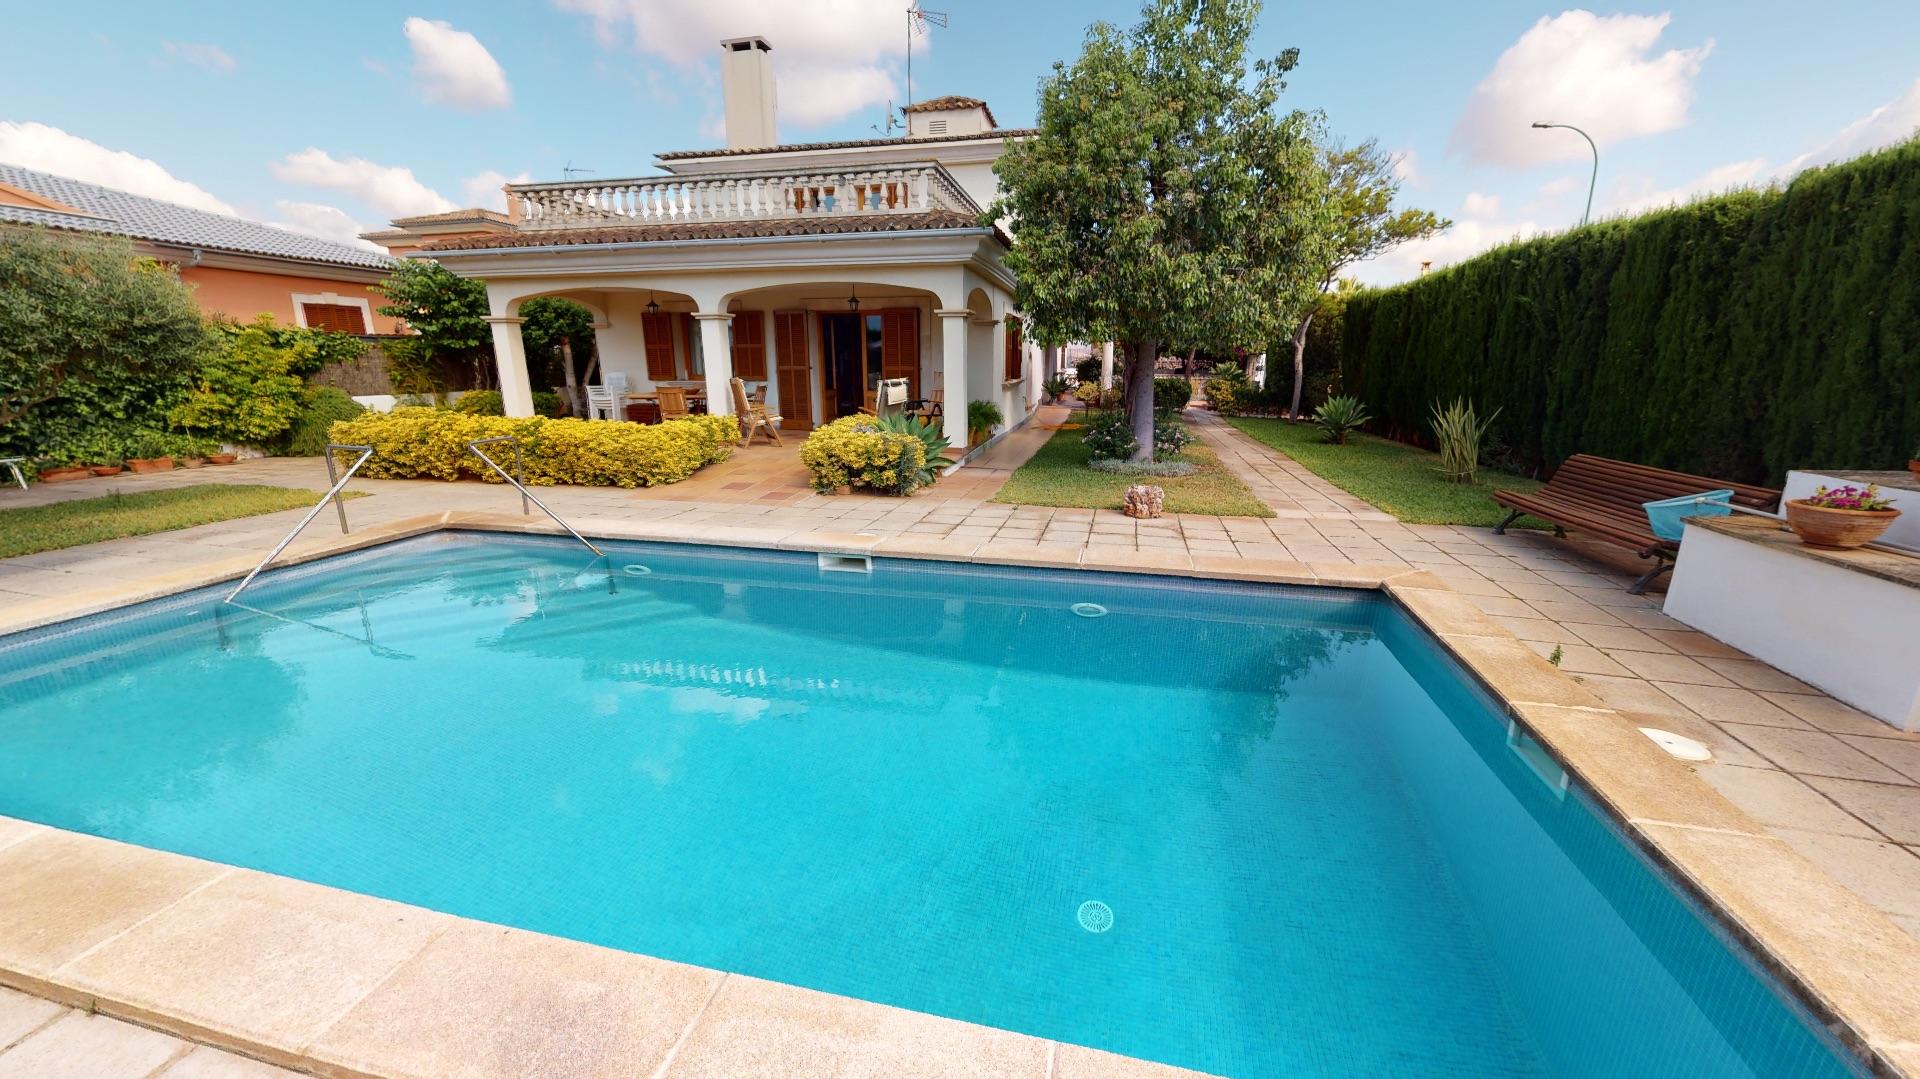 Villa in Marratxí, urb sa cabana, for sale